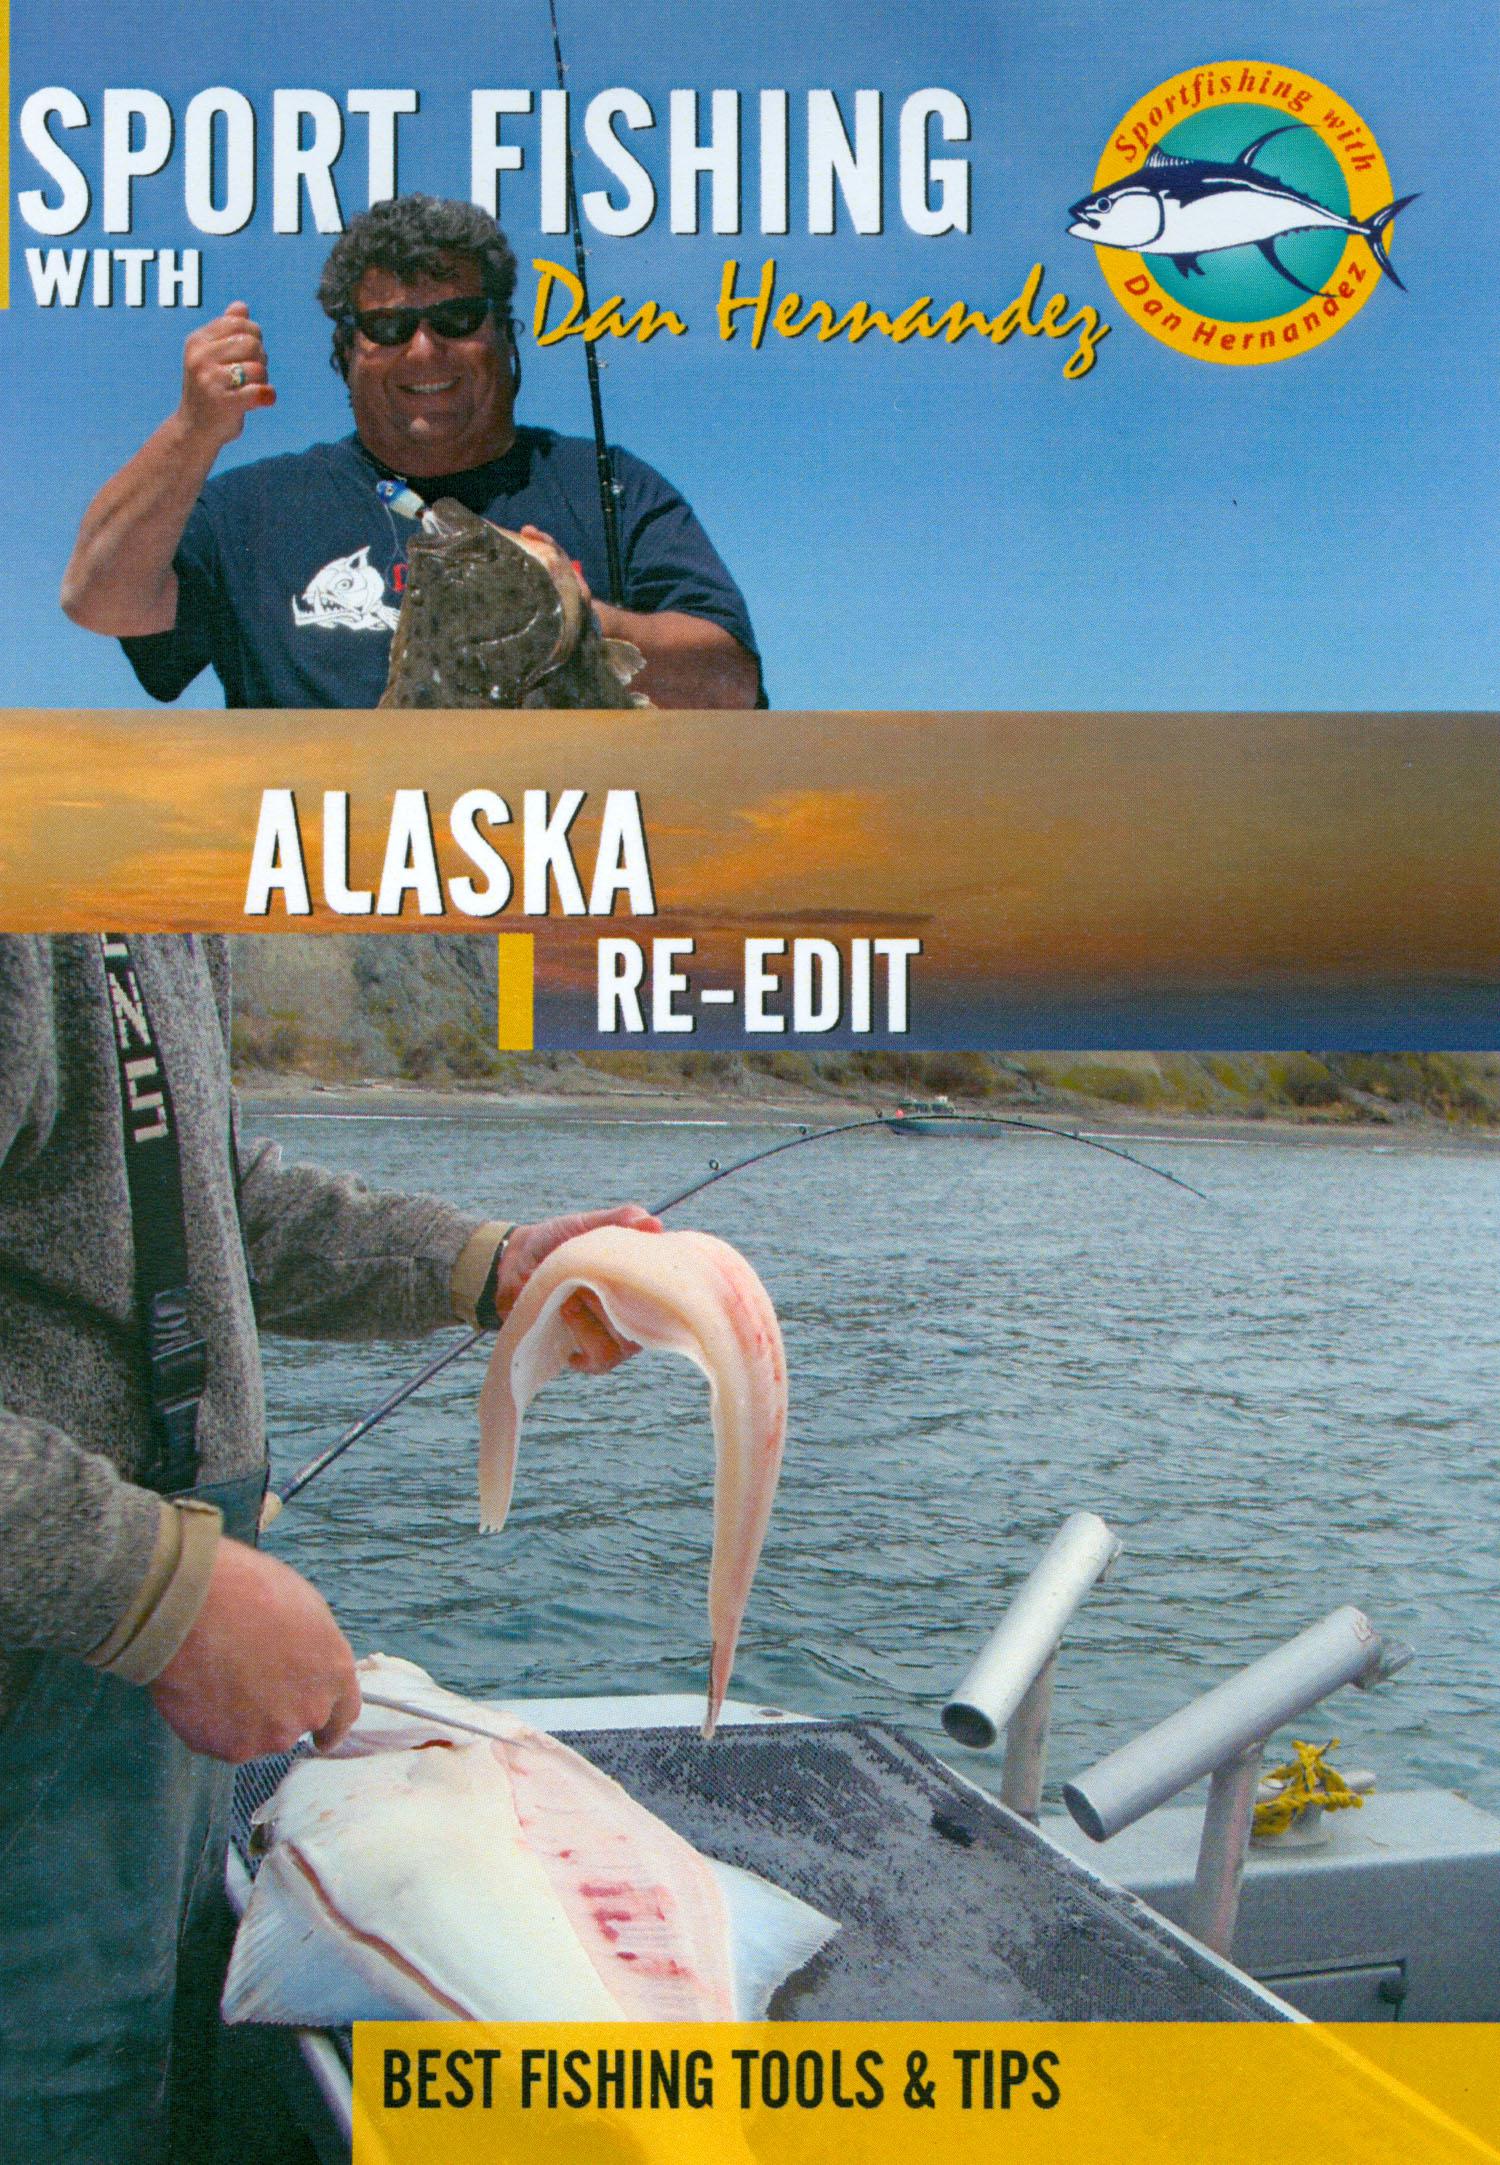 Sport Fishing With Dan Hernandez: Alaska